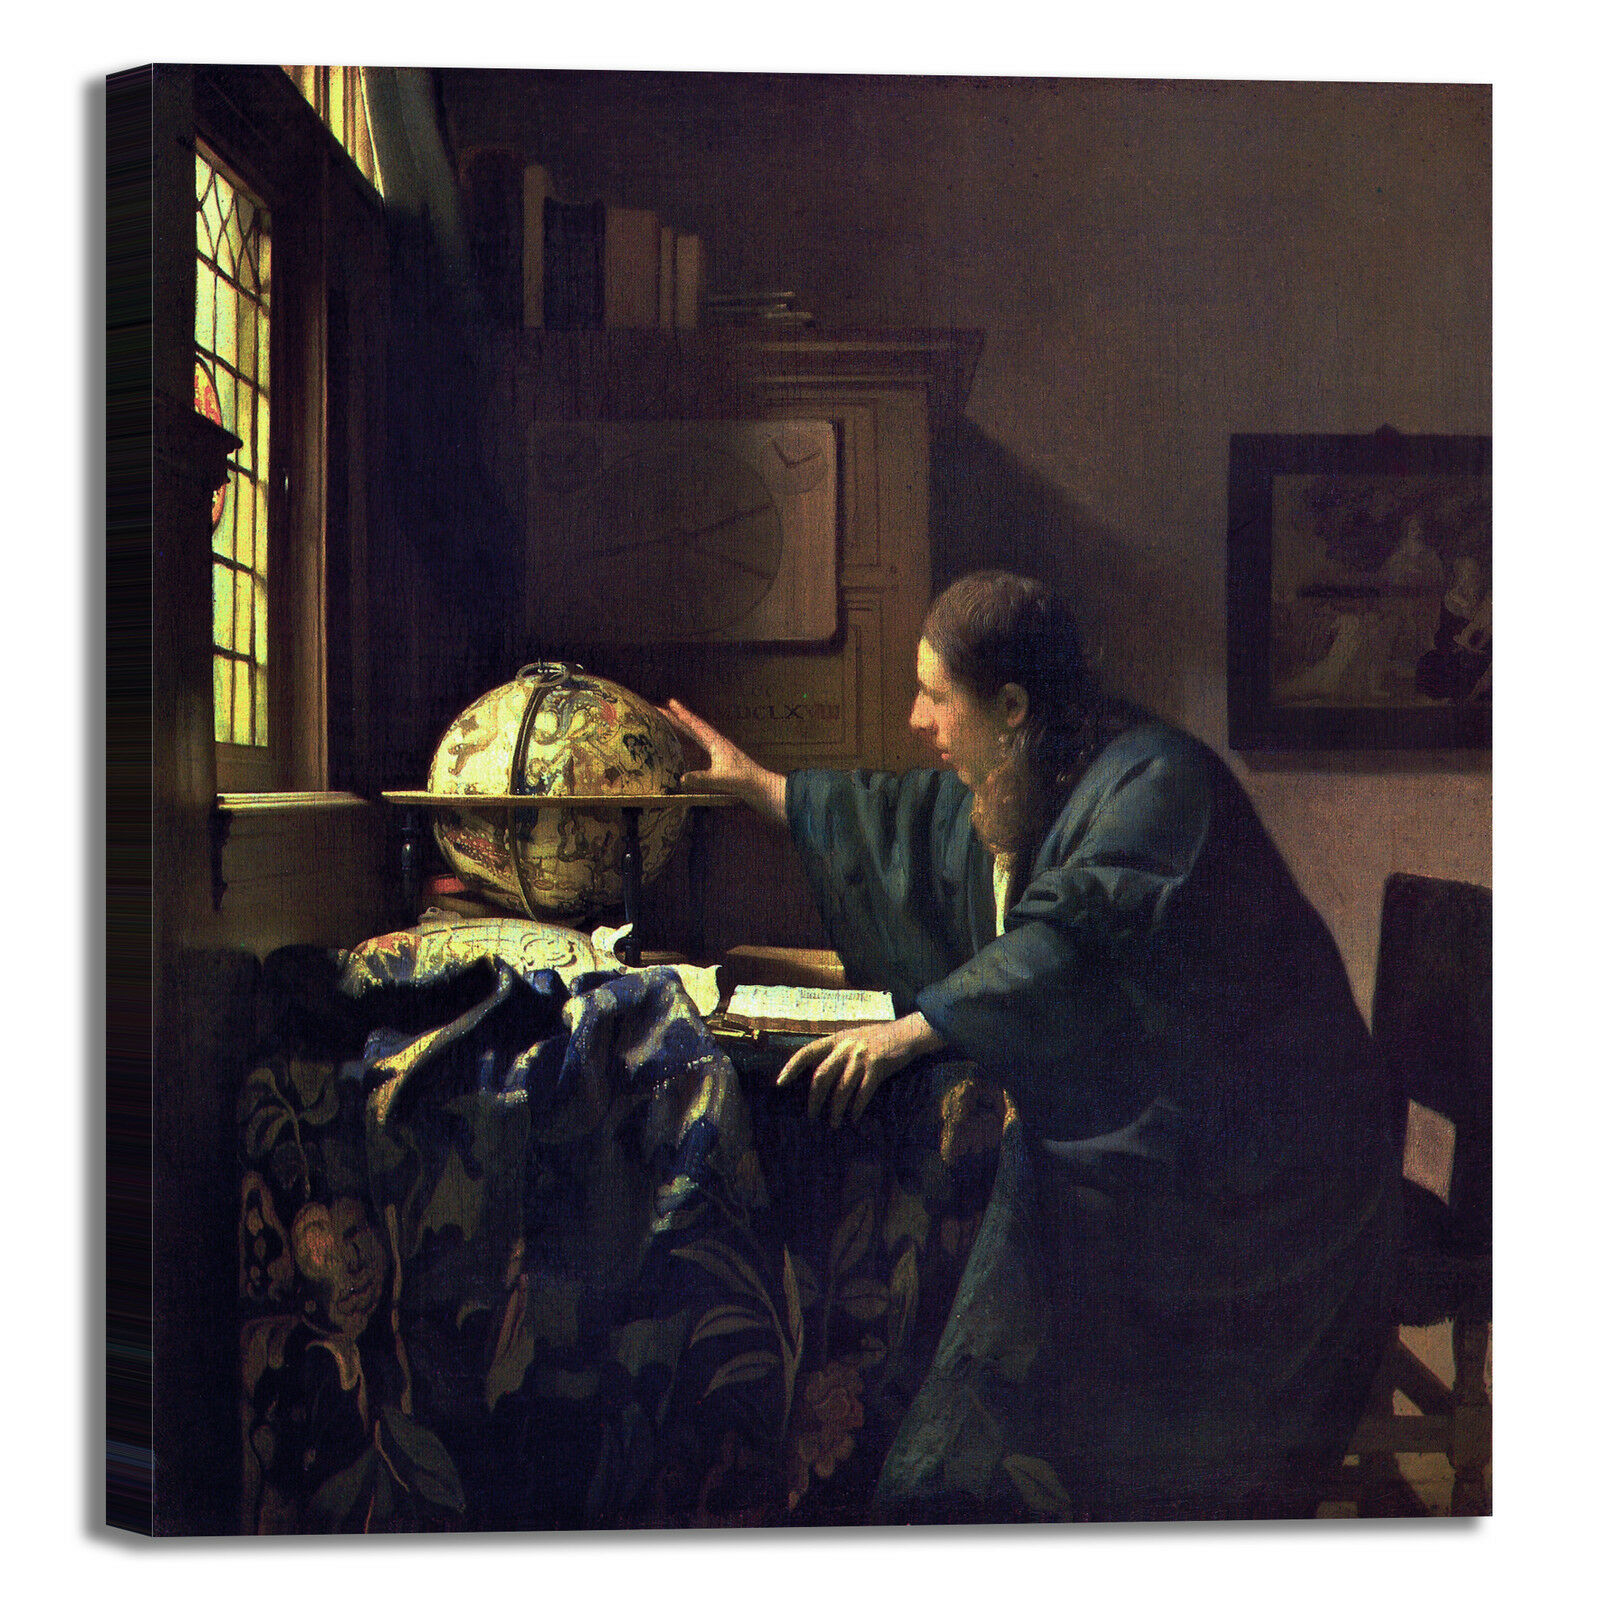 Vermeer astronomo design quadro stampa tela dipinto telaio telaio telaio arroto casa 15c641